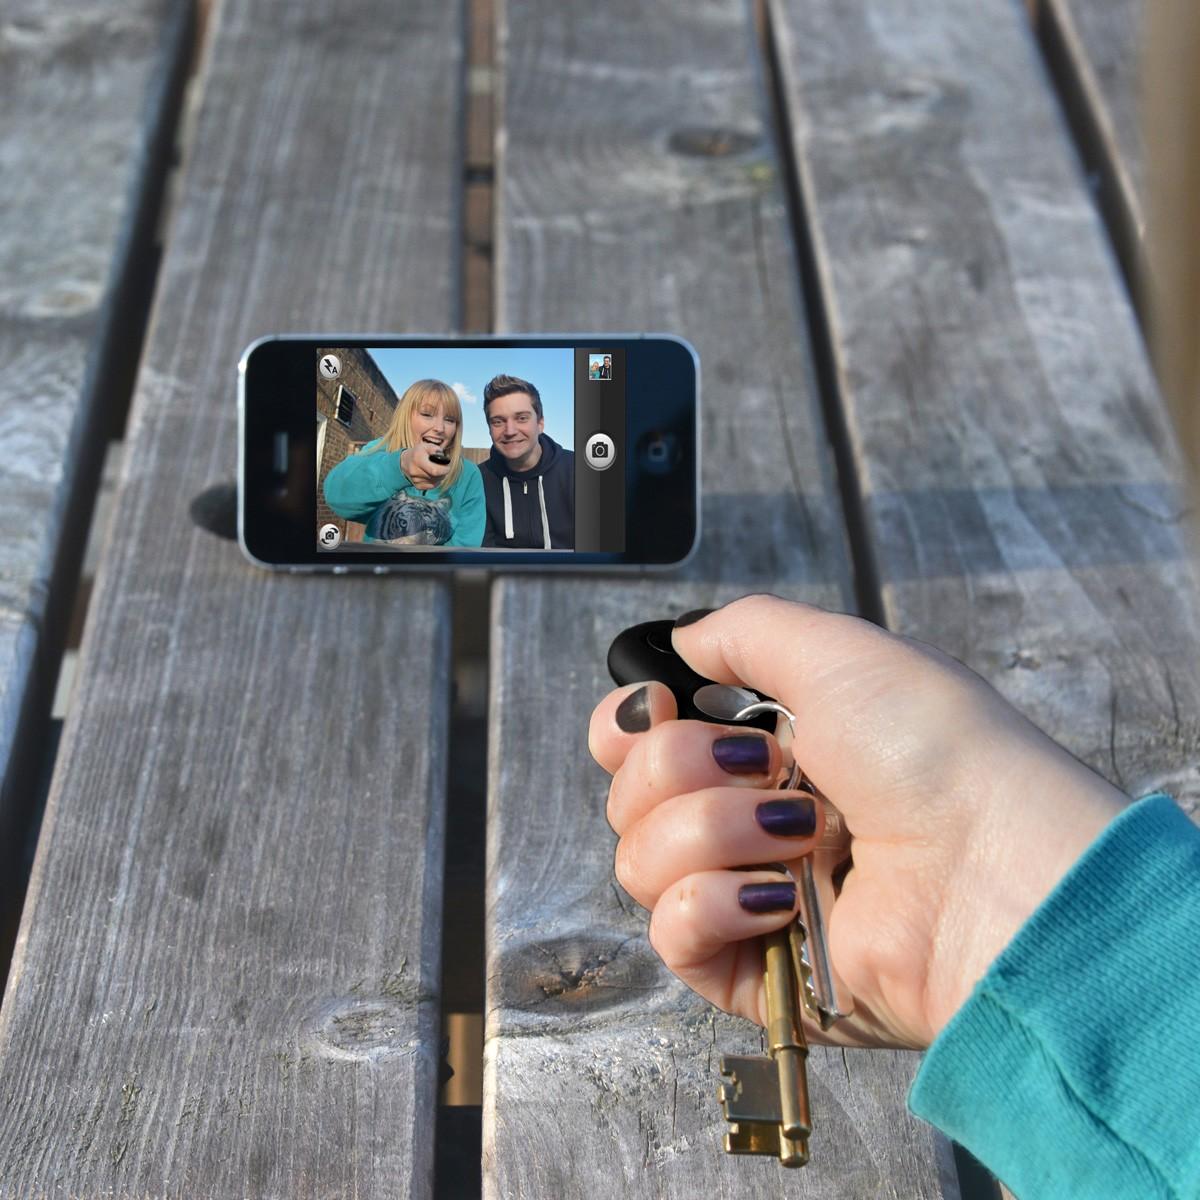 Brelok lokalizator z funkcją selfie